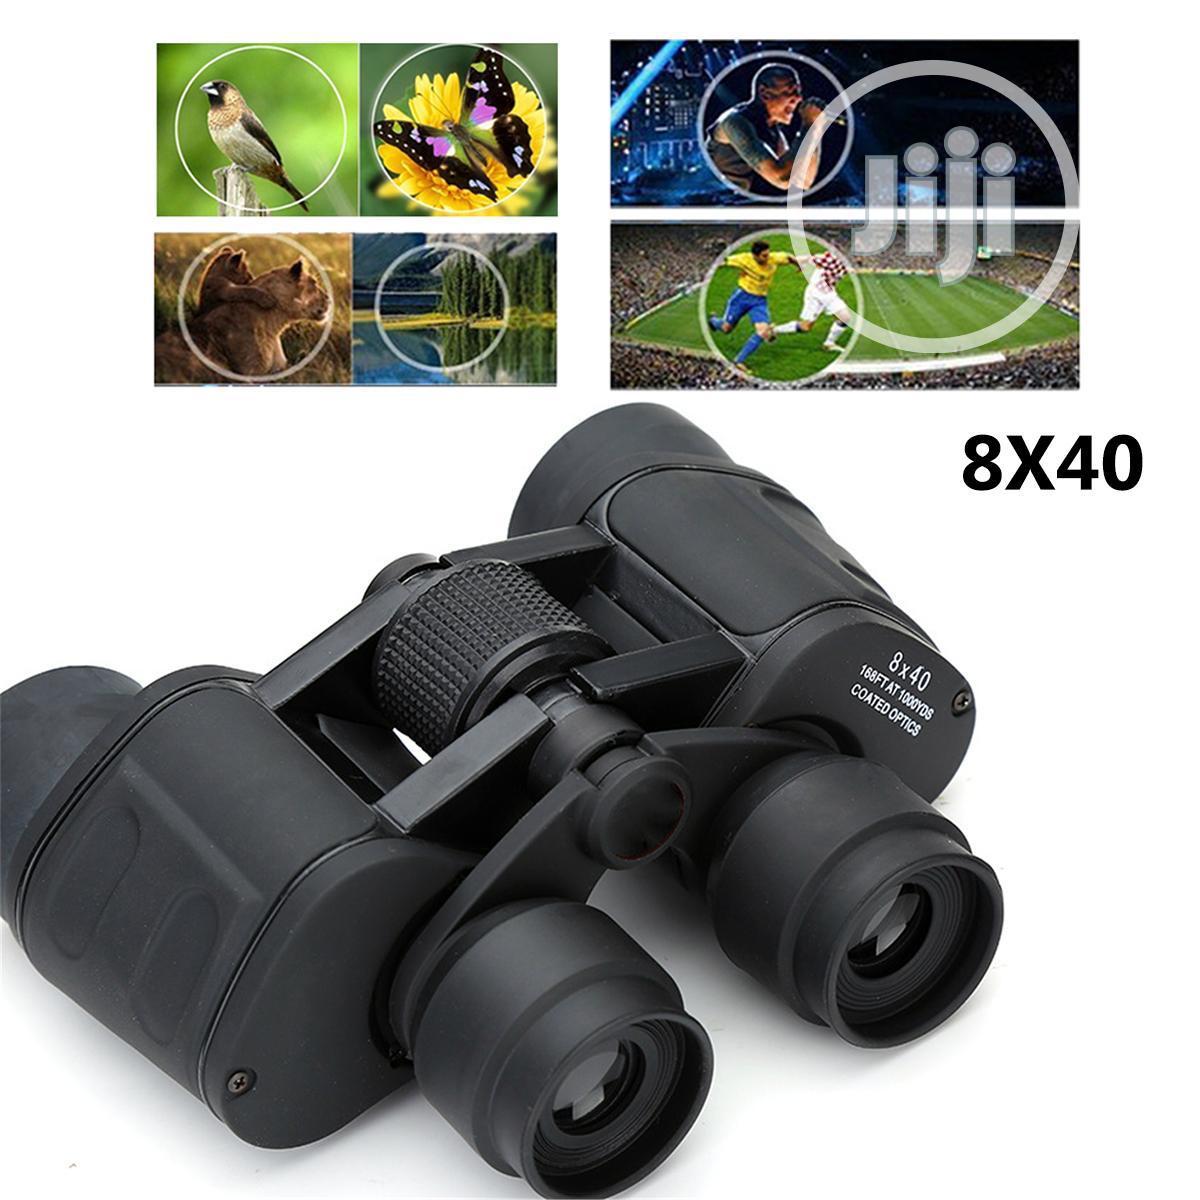 Waterproof Rubber Binoculars Night Vision Telescope